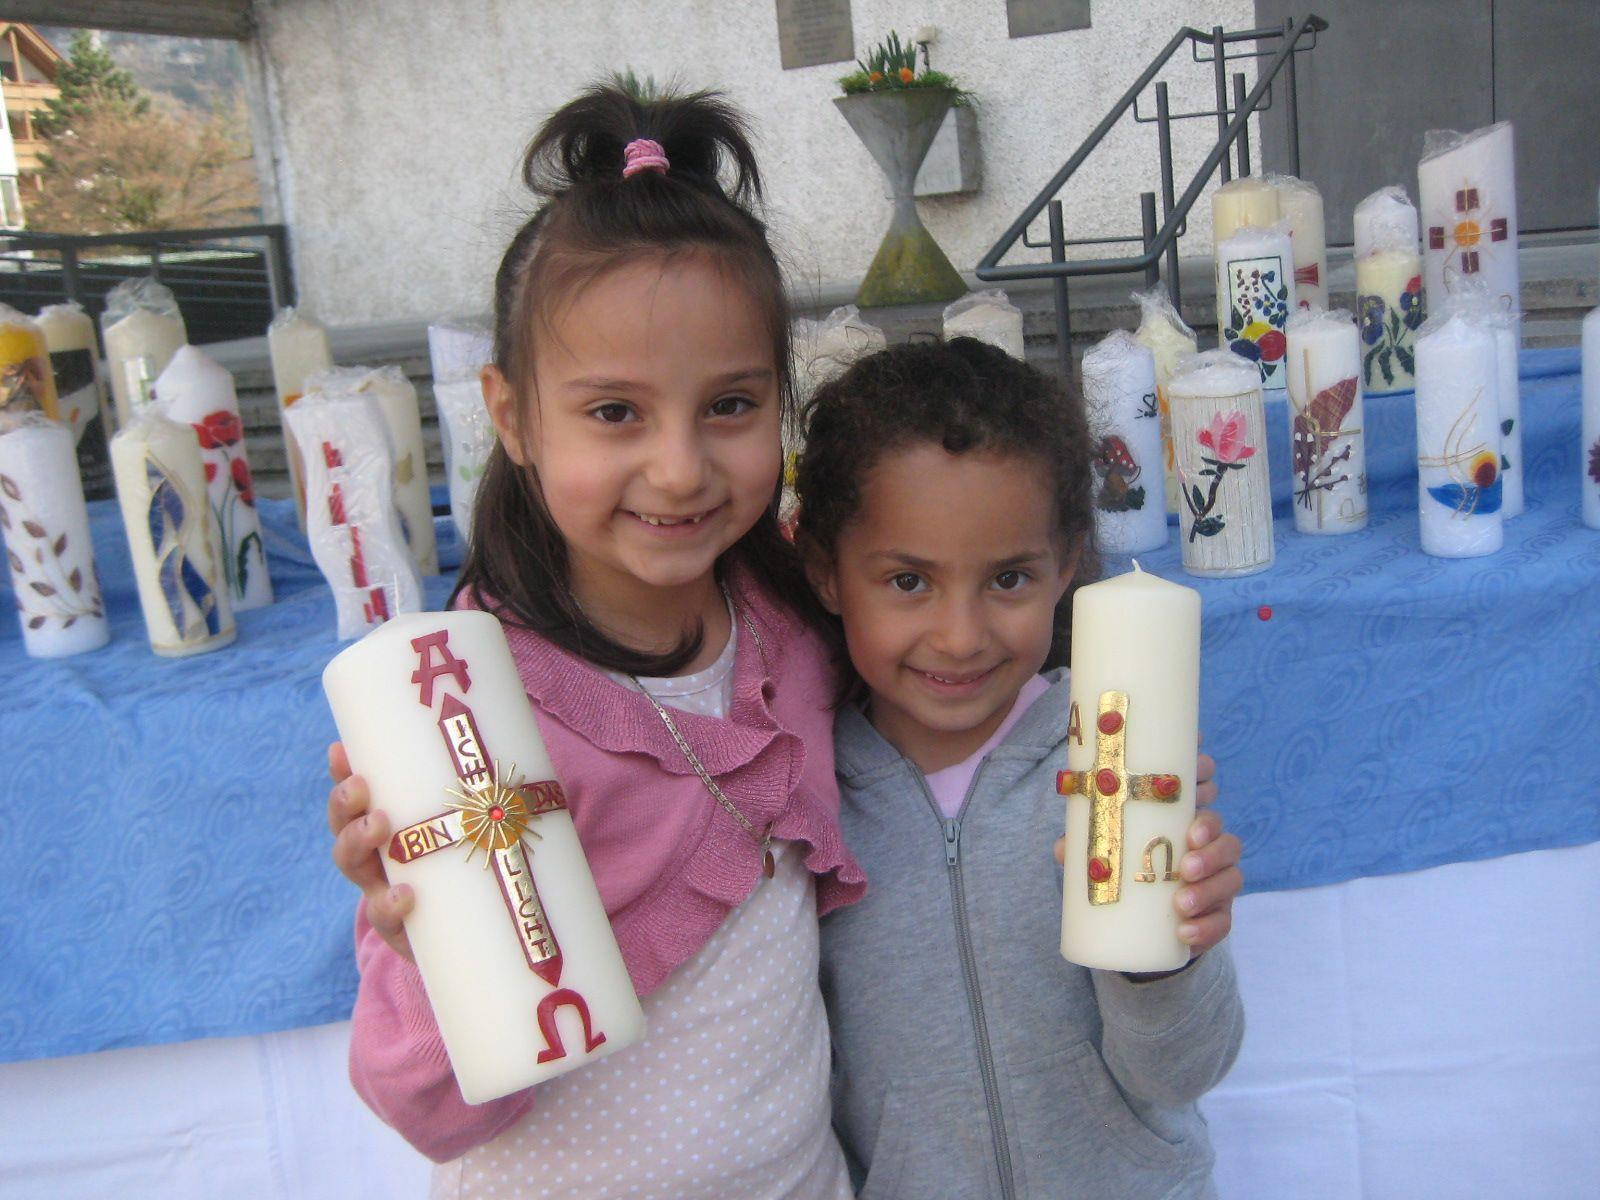 Angjelina und Cheyenne entdeckten hübsche Osterkerzen.